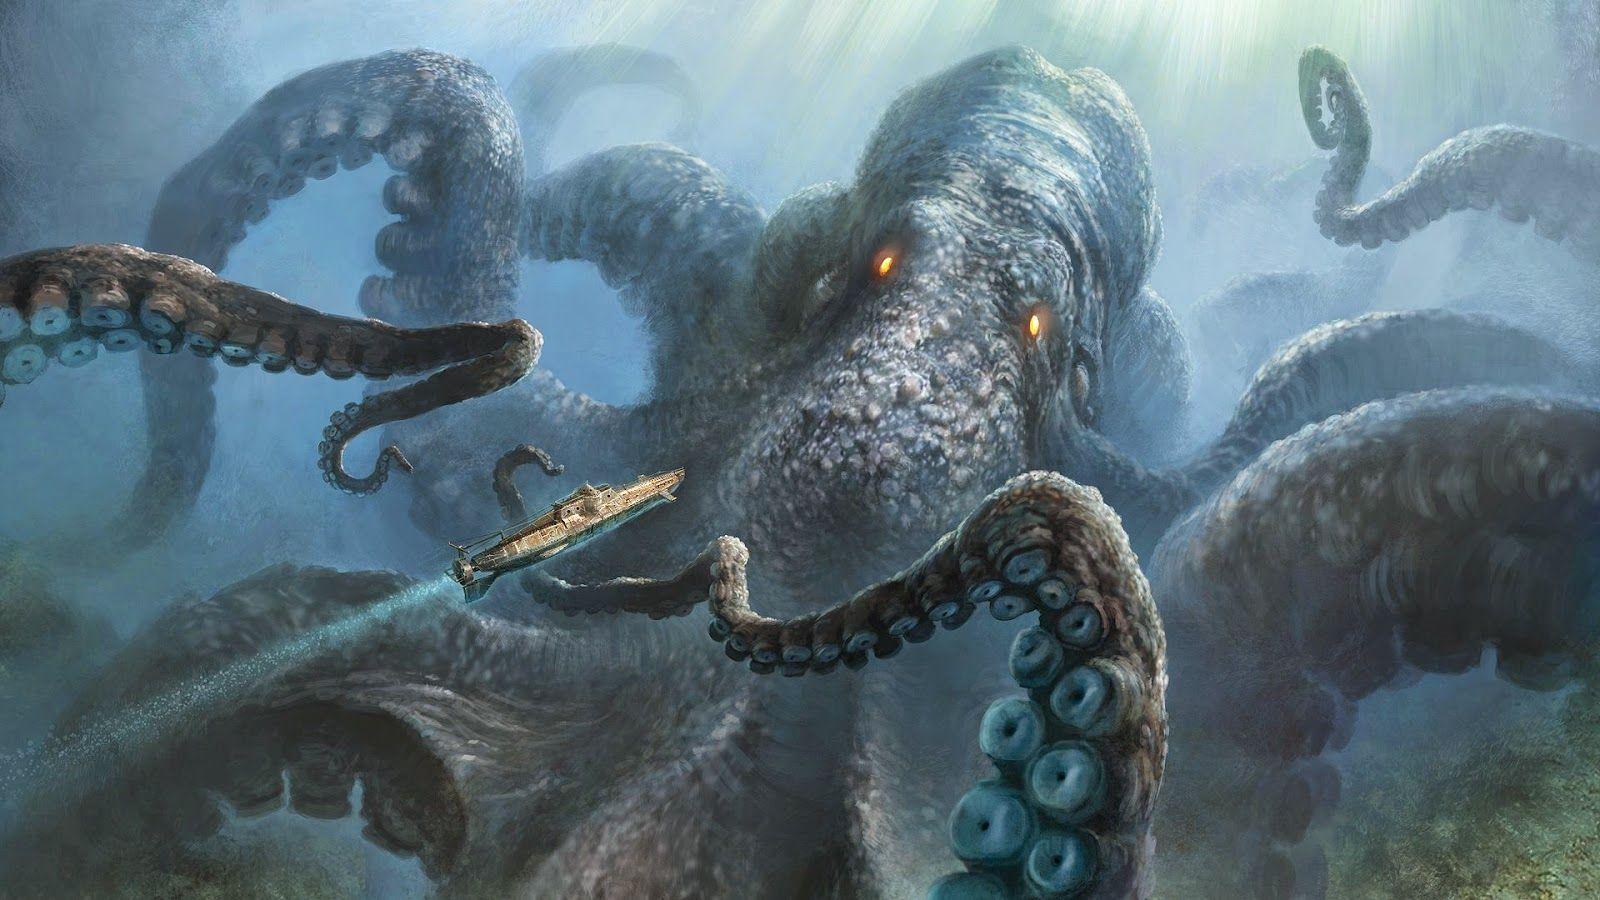 A Giant Octopus Is A Timeless Deep Sea Terror Sea Monsters Kraken Sea Creatures